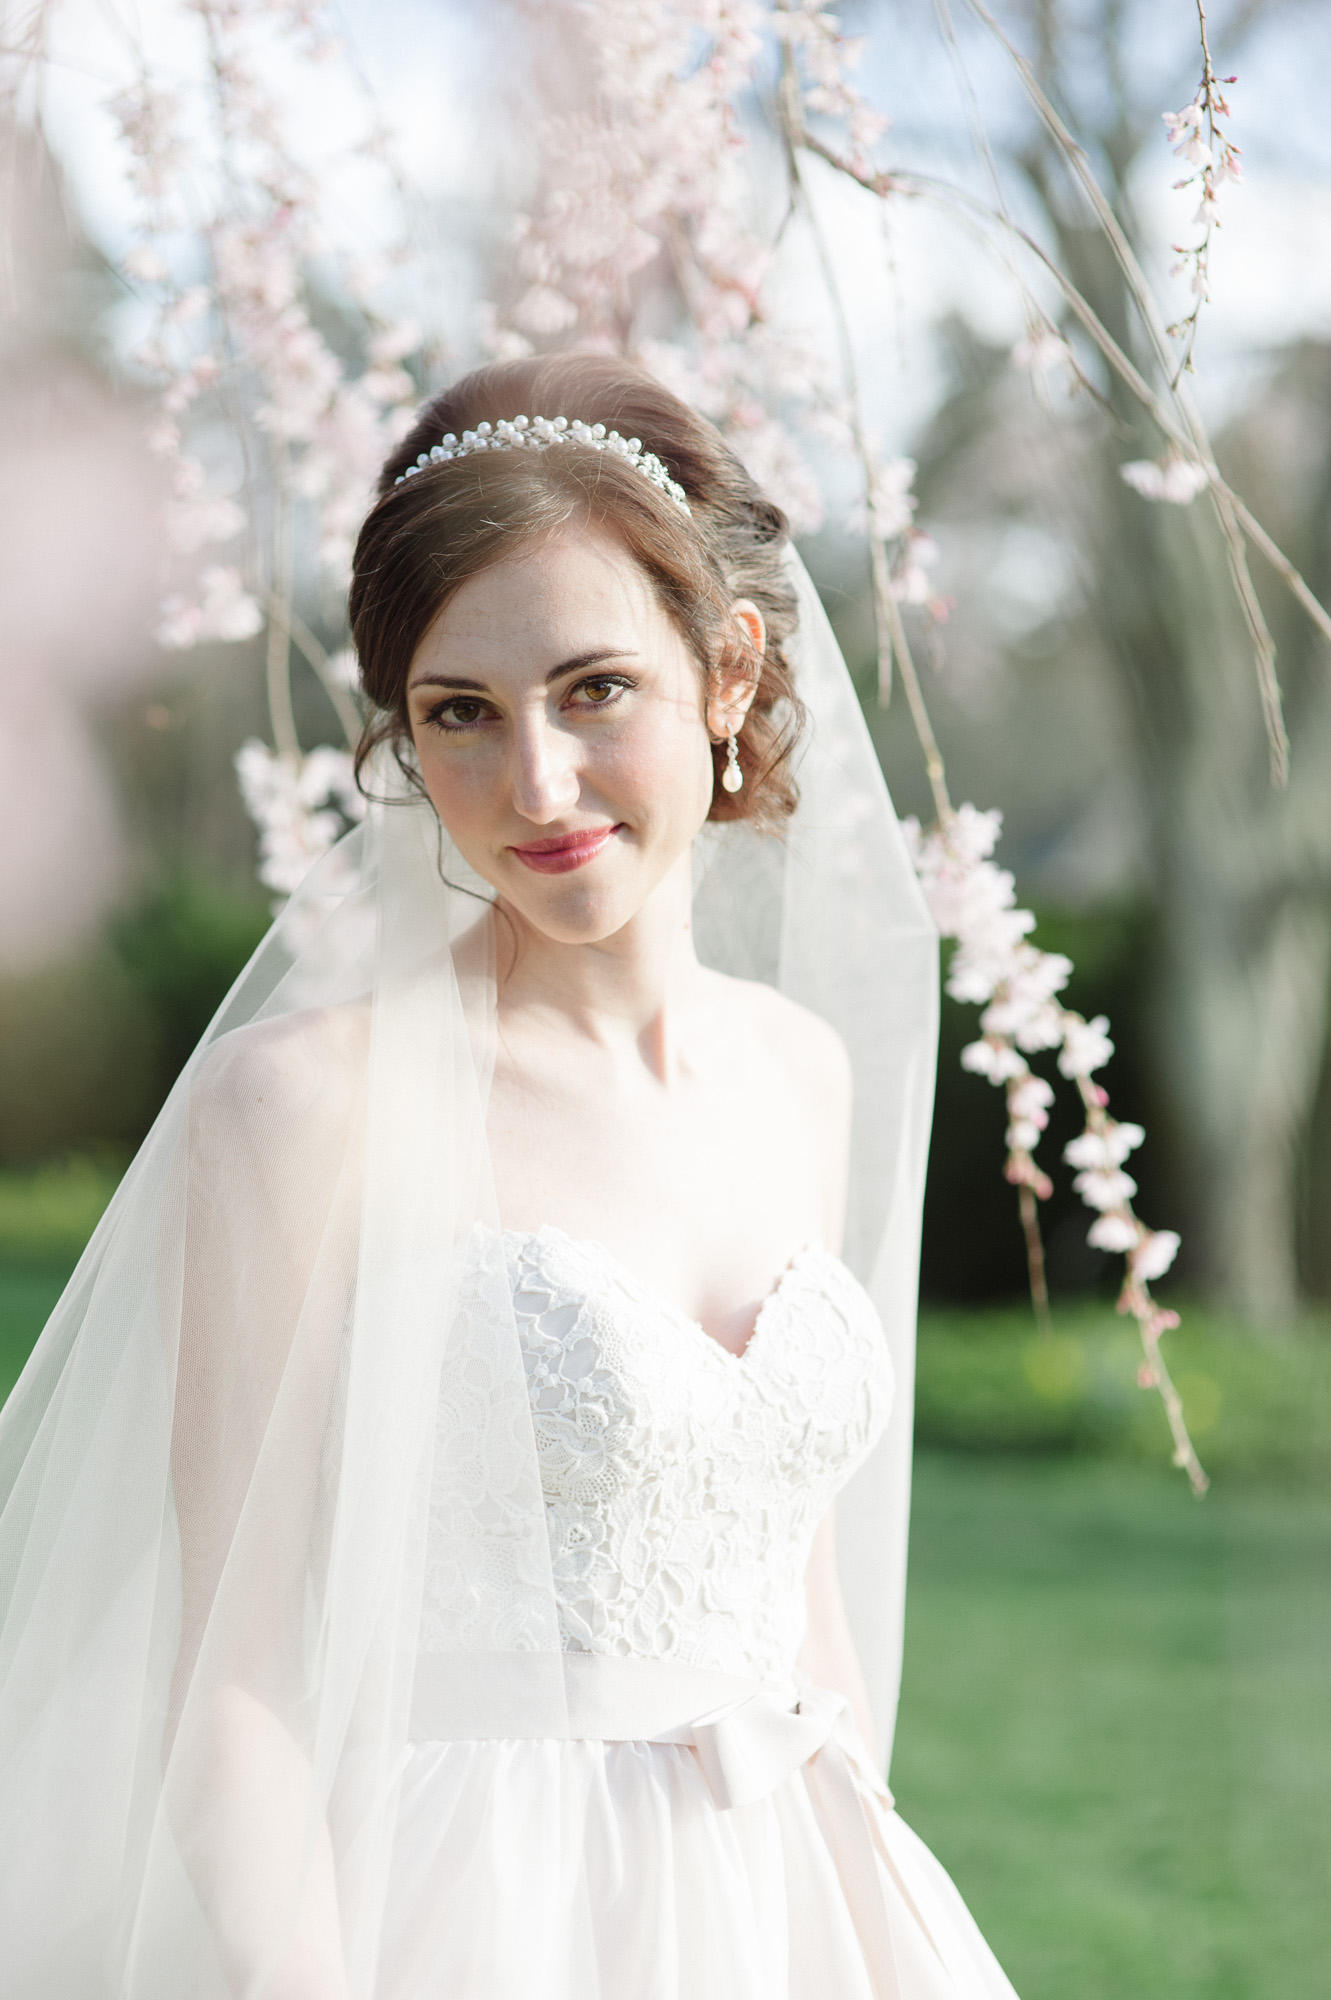 Bridals | Caroline Bell | ©2015 Glessner Photography (11 of 17).jpg